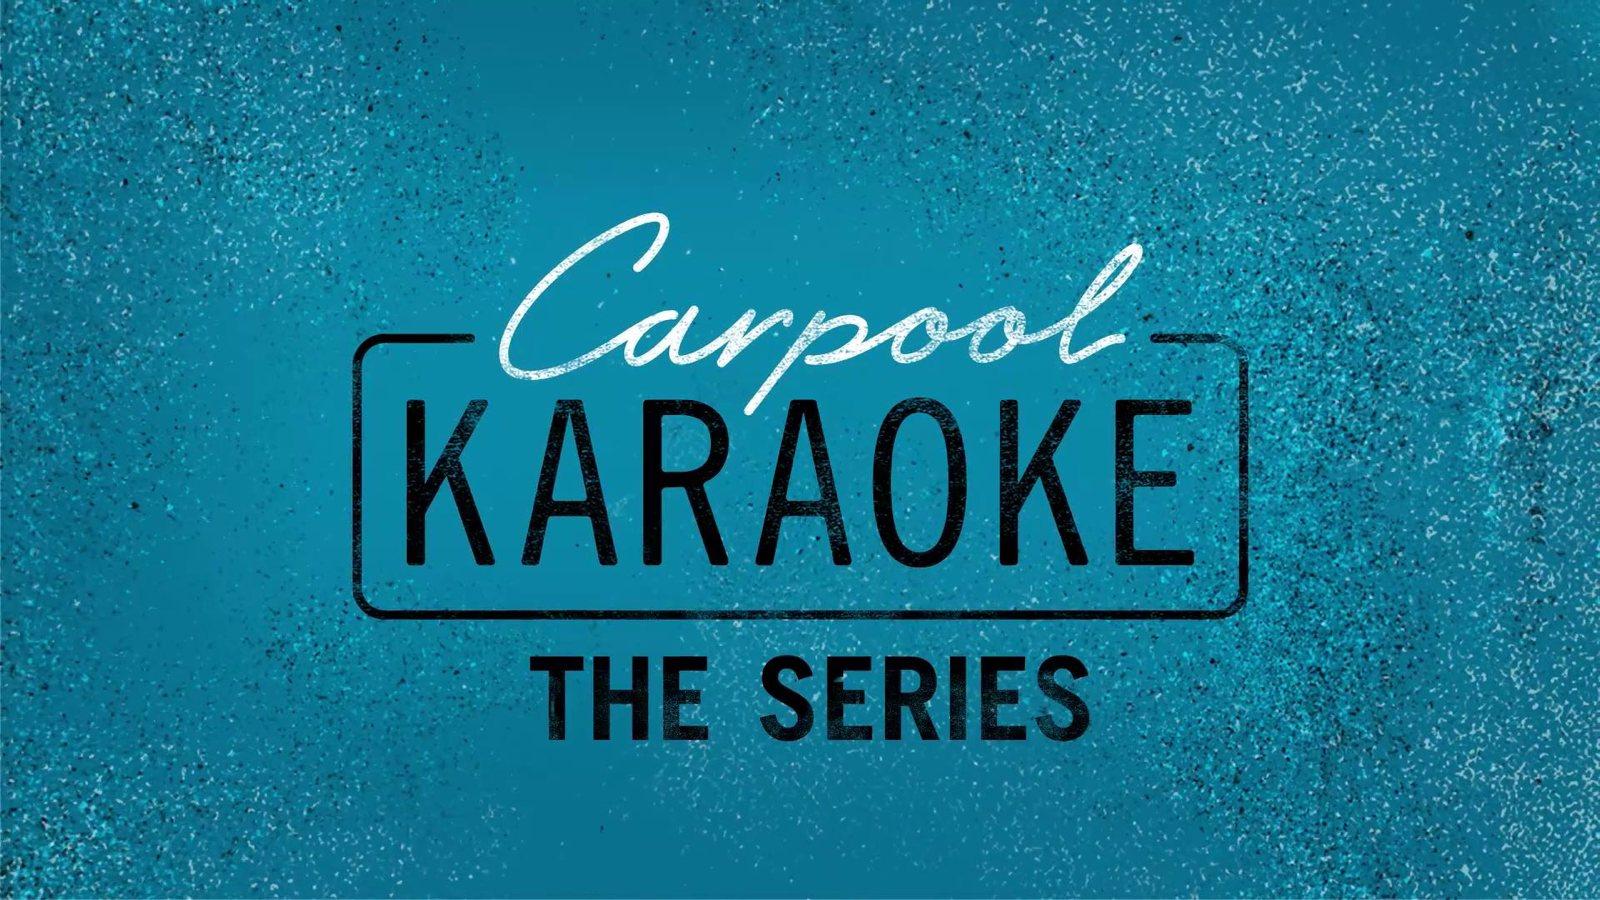 apple launching season 2 of carpool karaoke for free through the tv app starting october 12